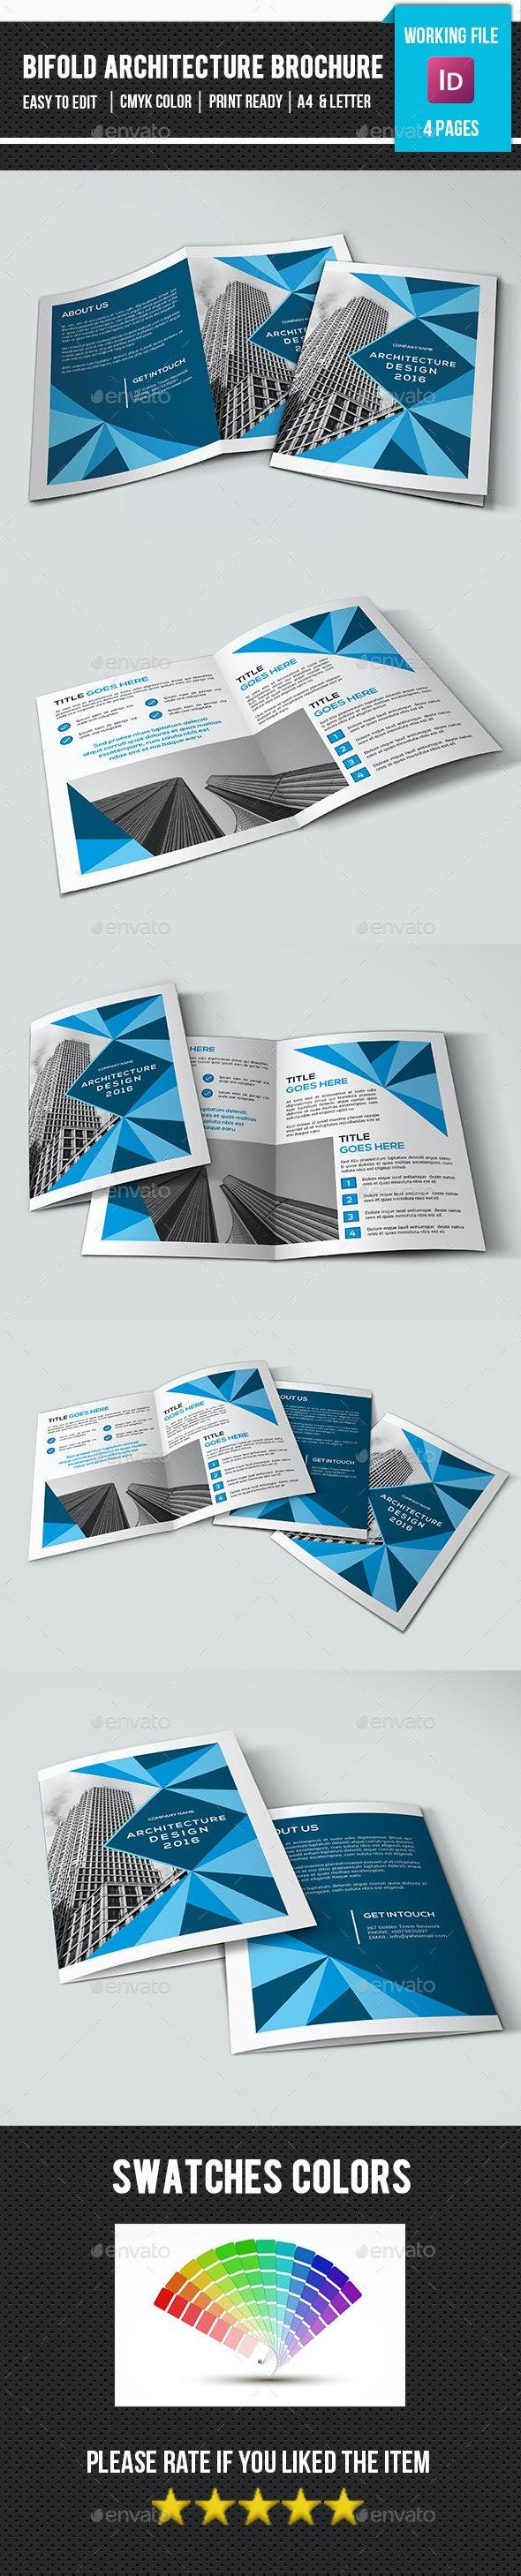 Business Bifold Brochure-V366 - Corporate Brochures